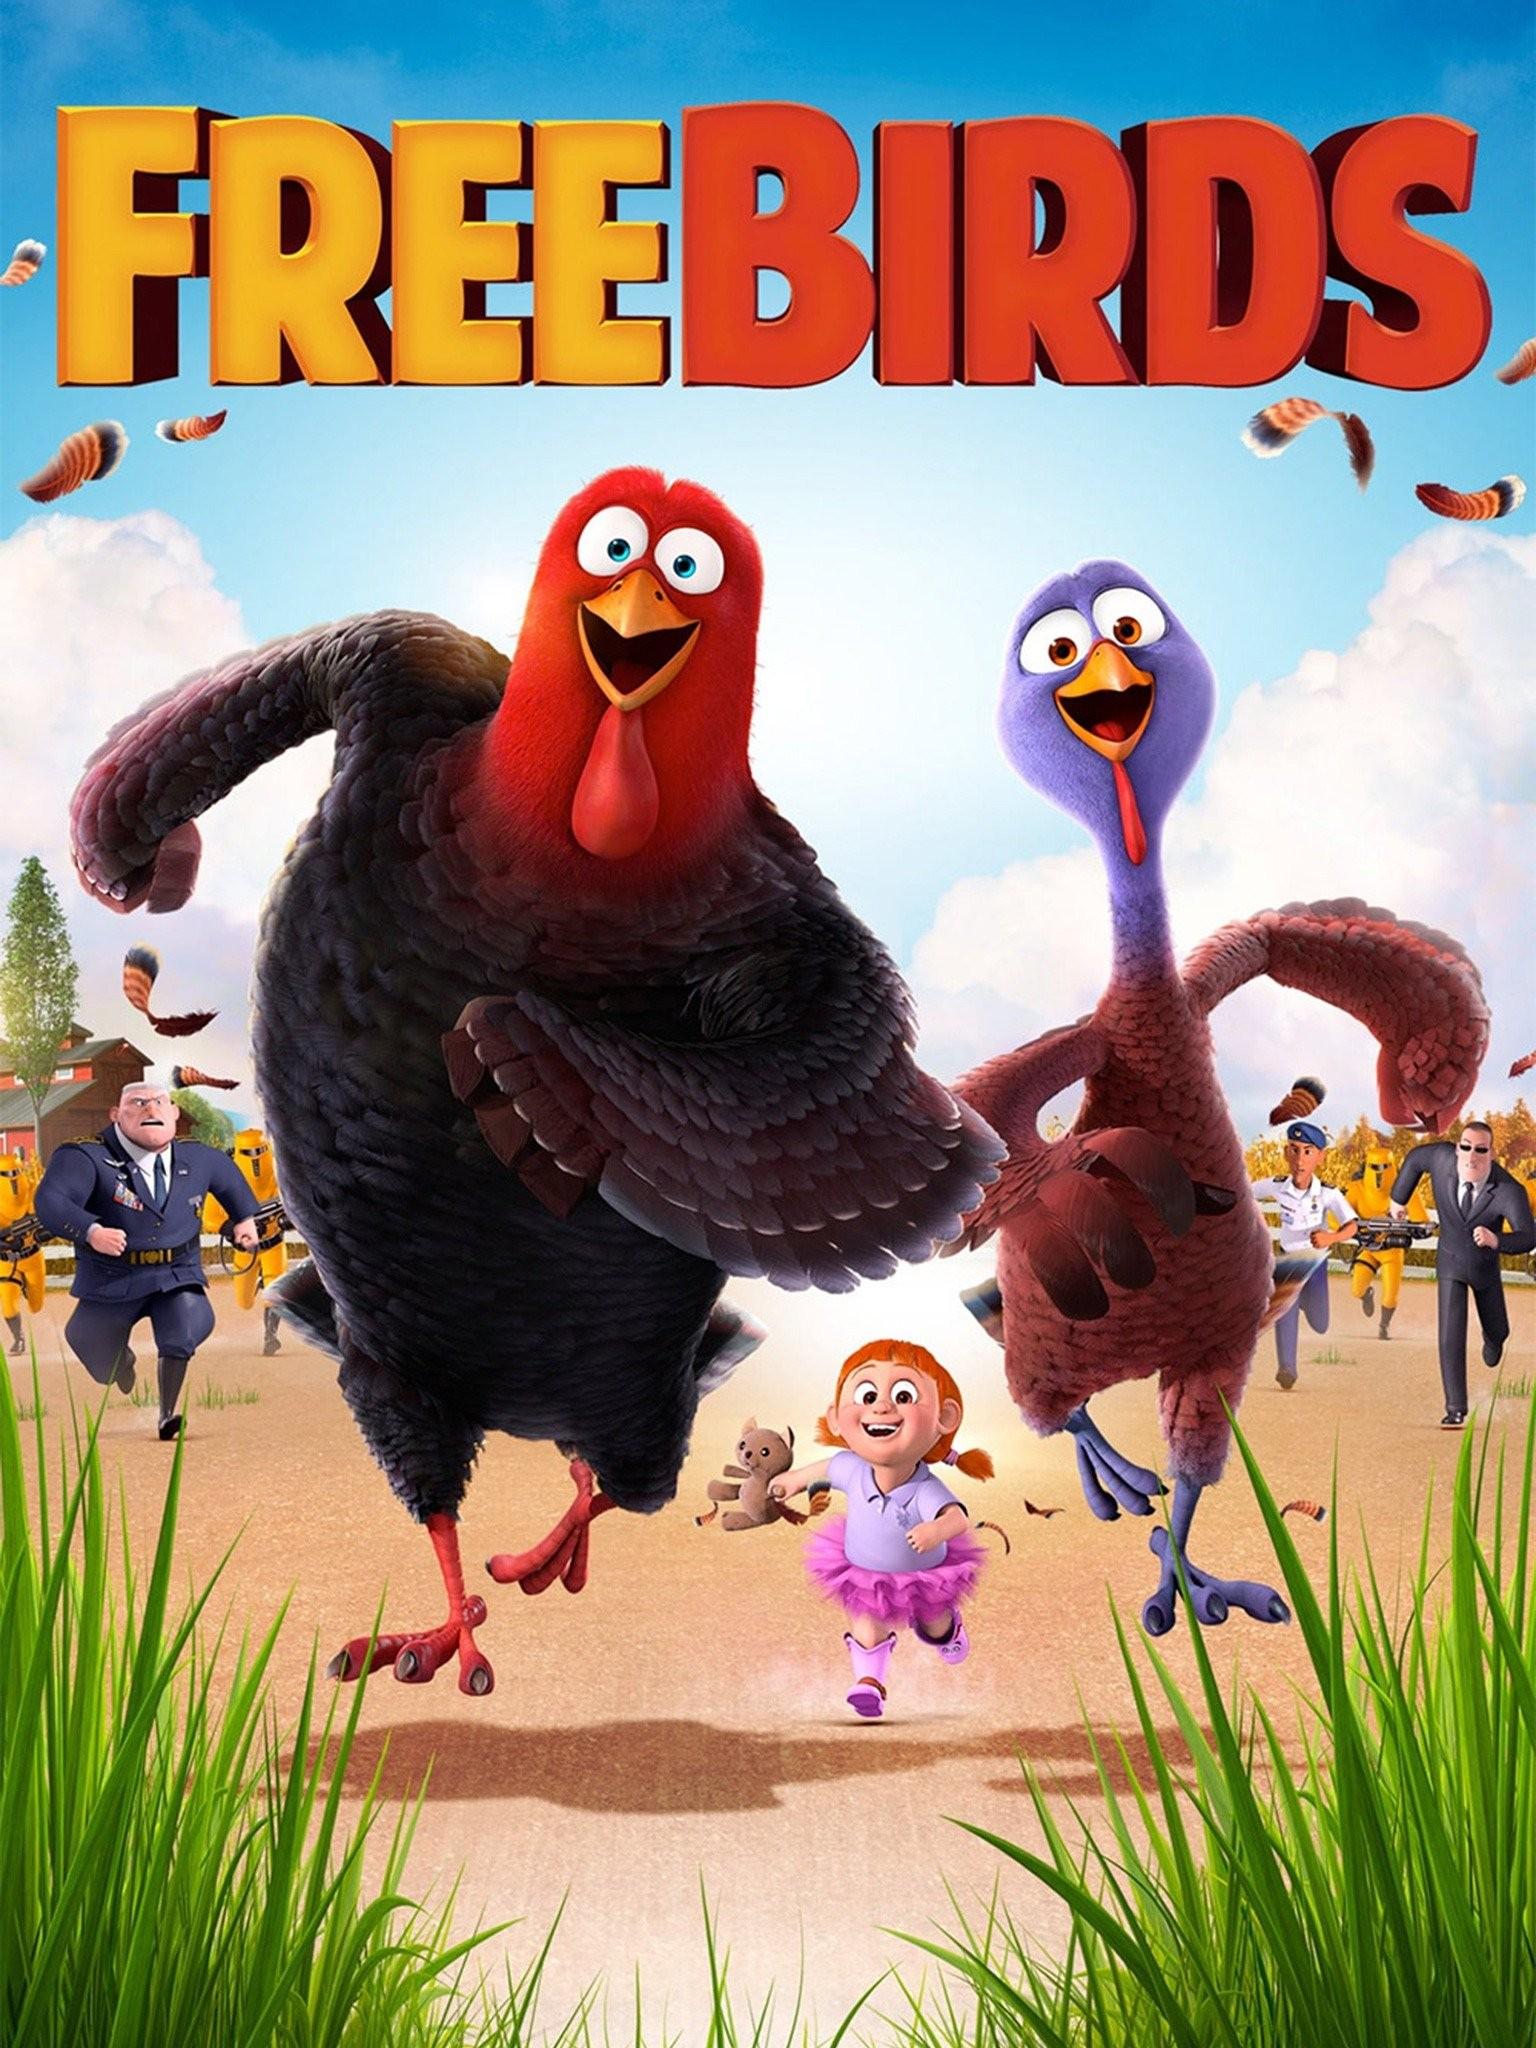 Free Birds (2013) Hindi ORG Dual Audio BluRay 350MB Download